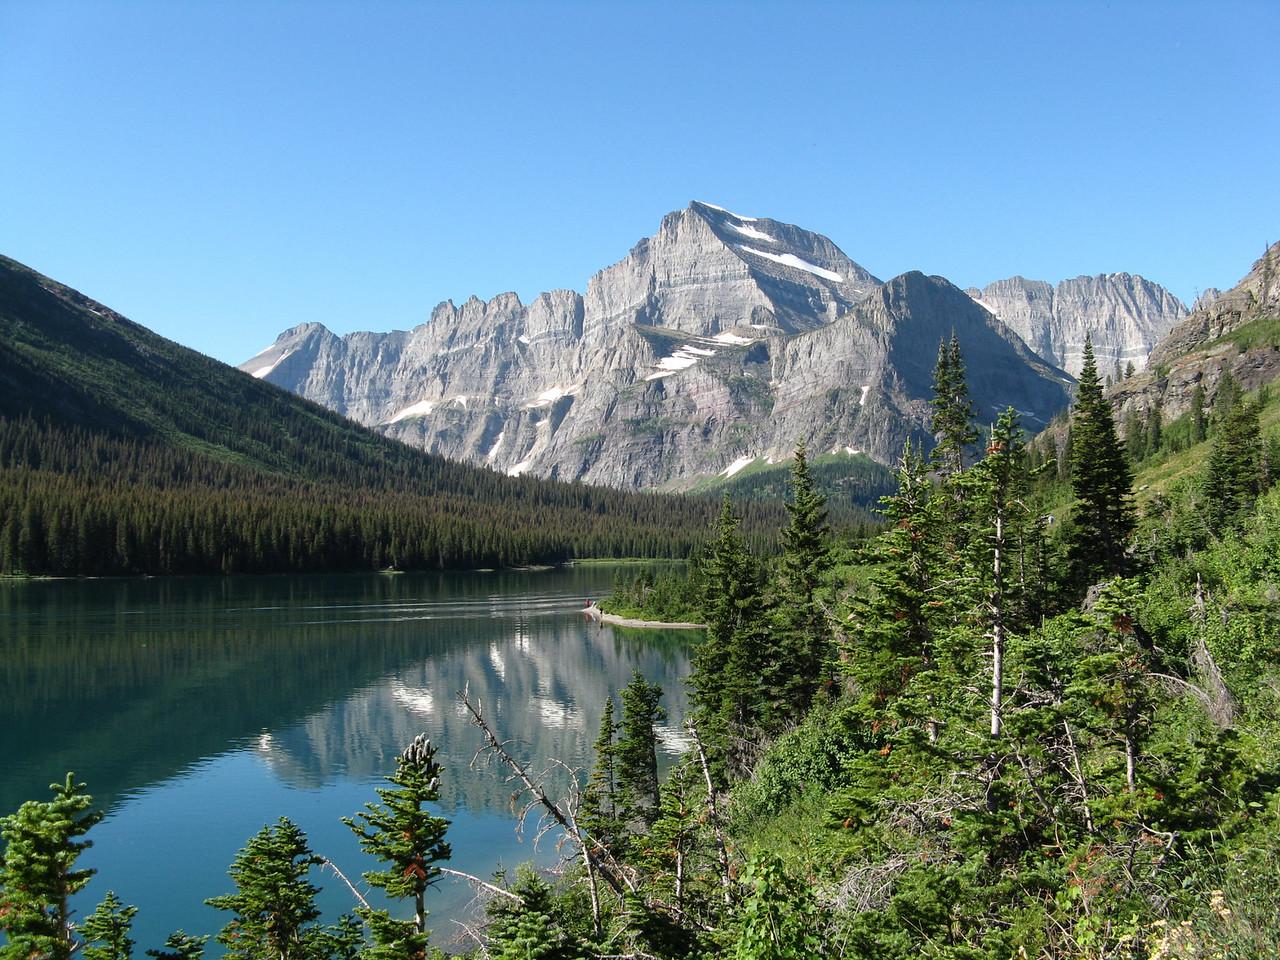 Mount Gould above Lake Josephine.